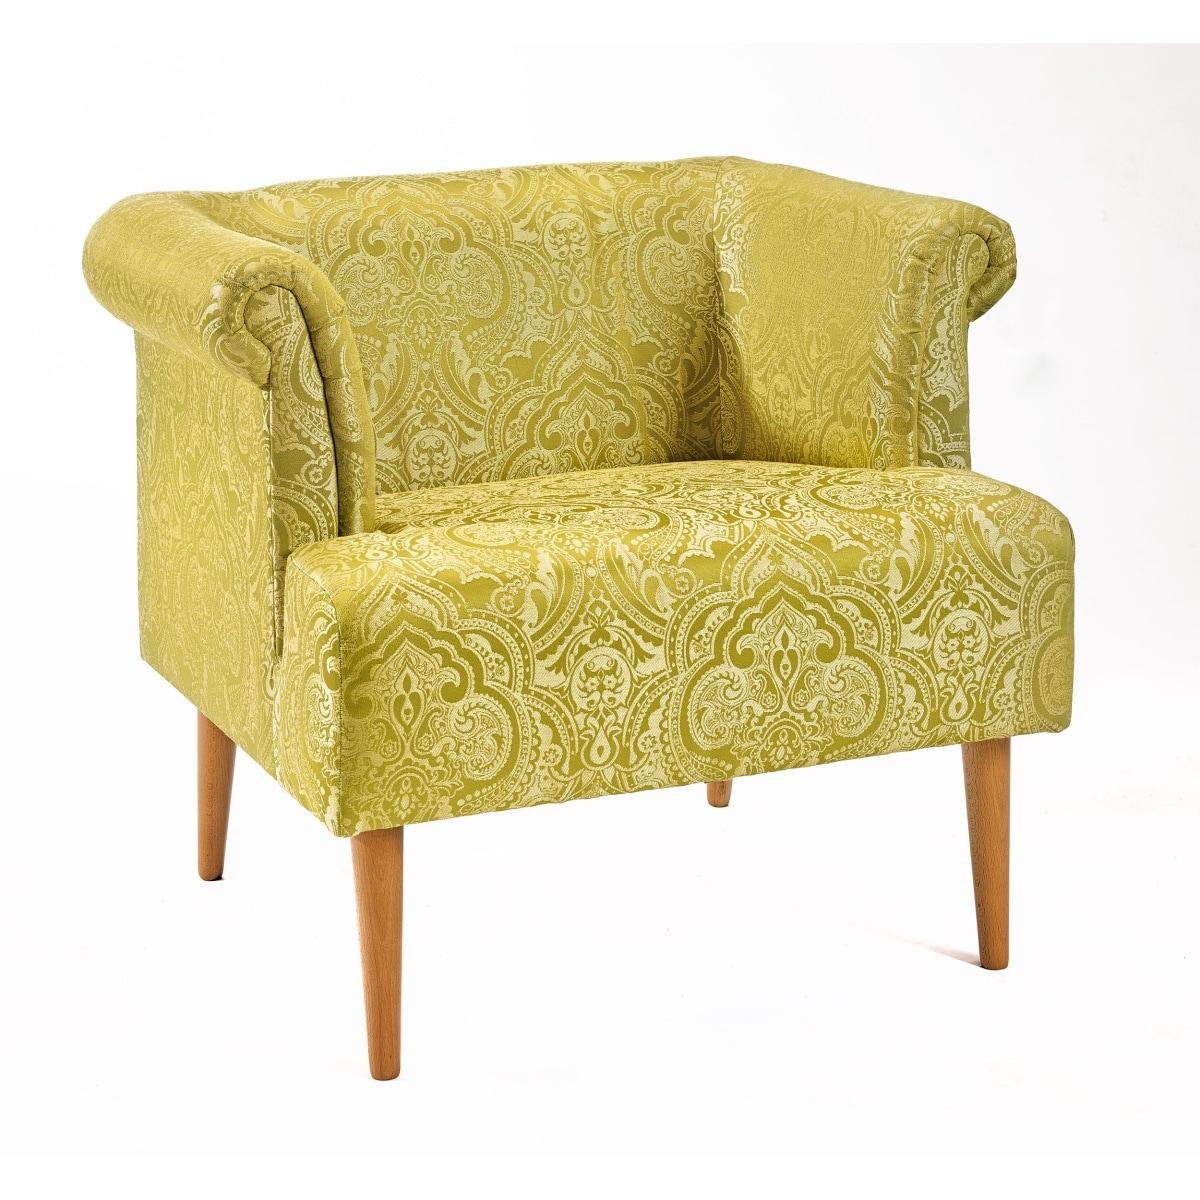 Sessel gemustert  INTERhome Sessel SWING Stoffbezug Gelb gemustert ca. 87 x 71 x 73 ...